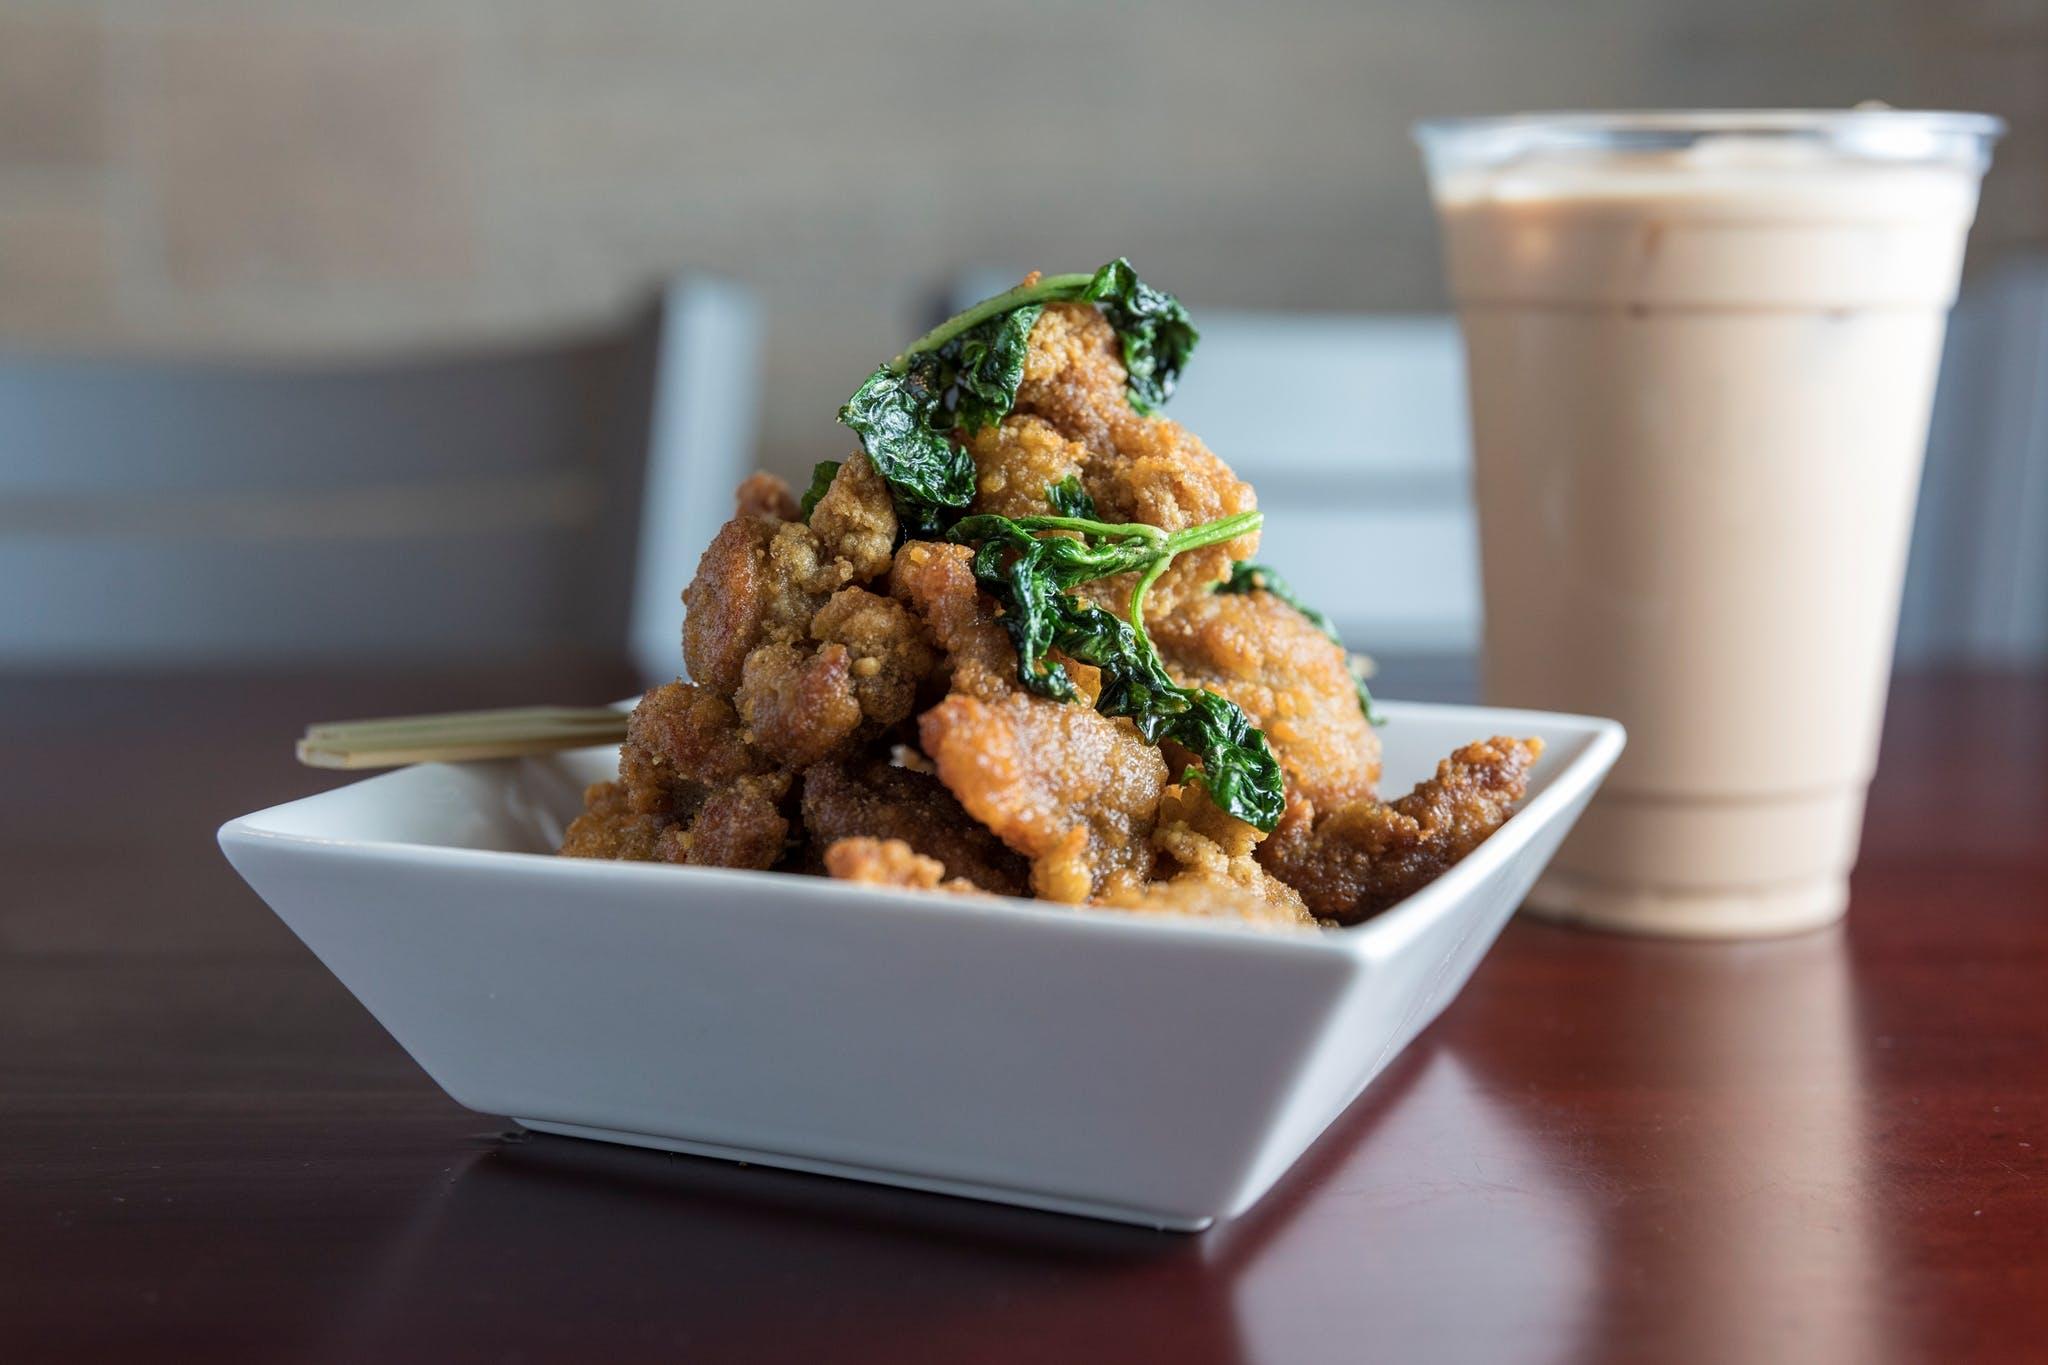 Popcorn Chicken from Jade Dragon Restaurant in Oshkosh, WI